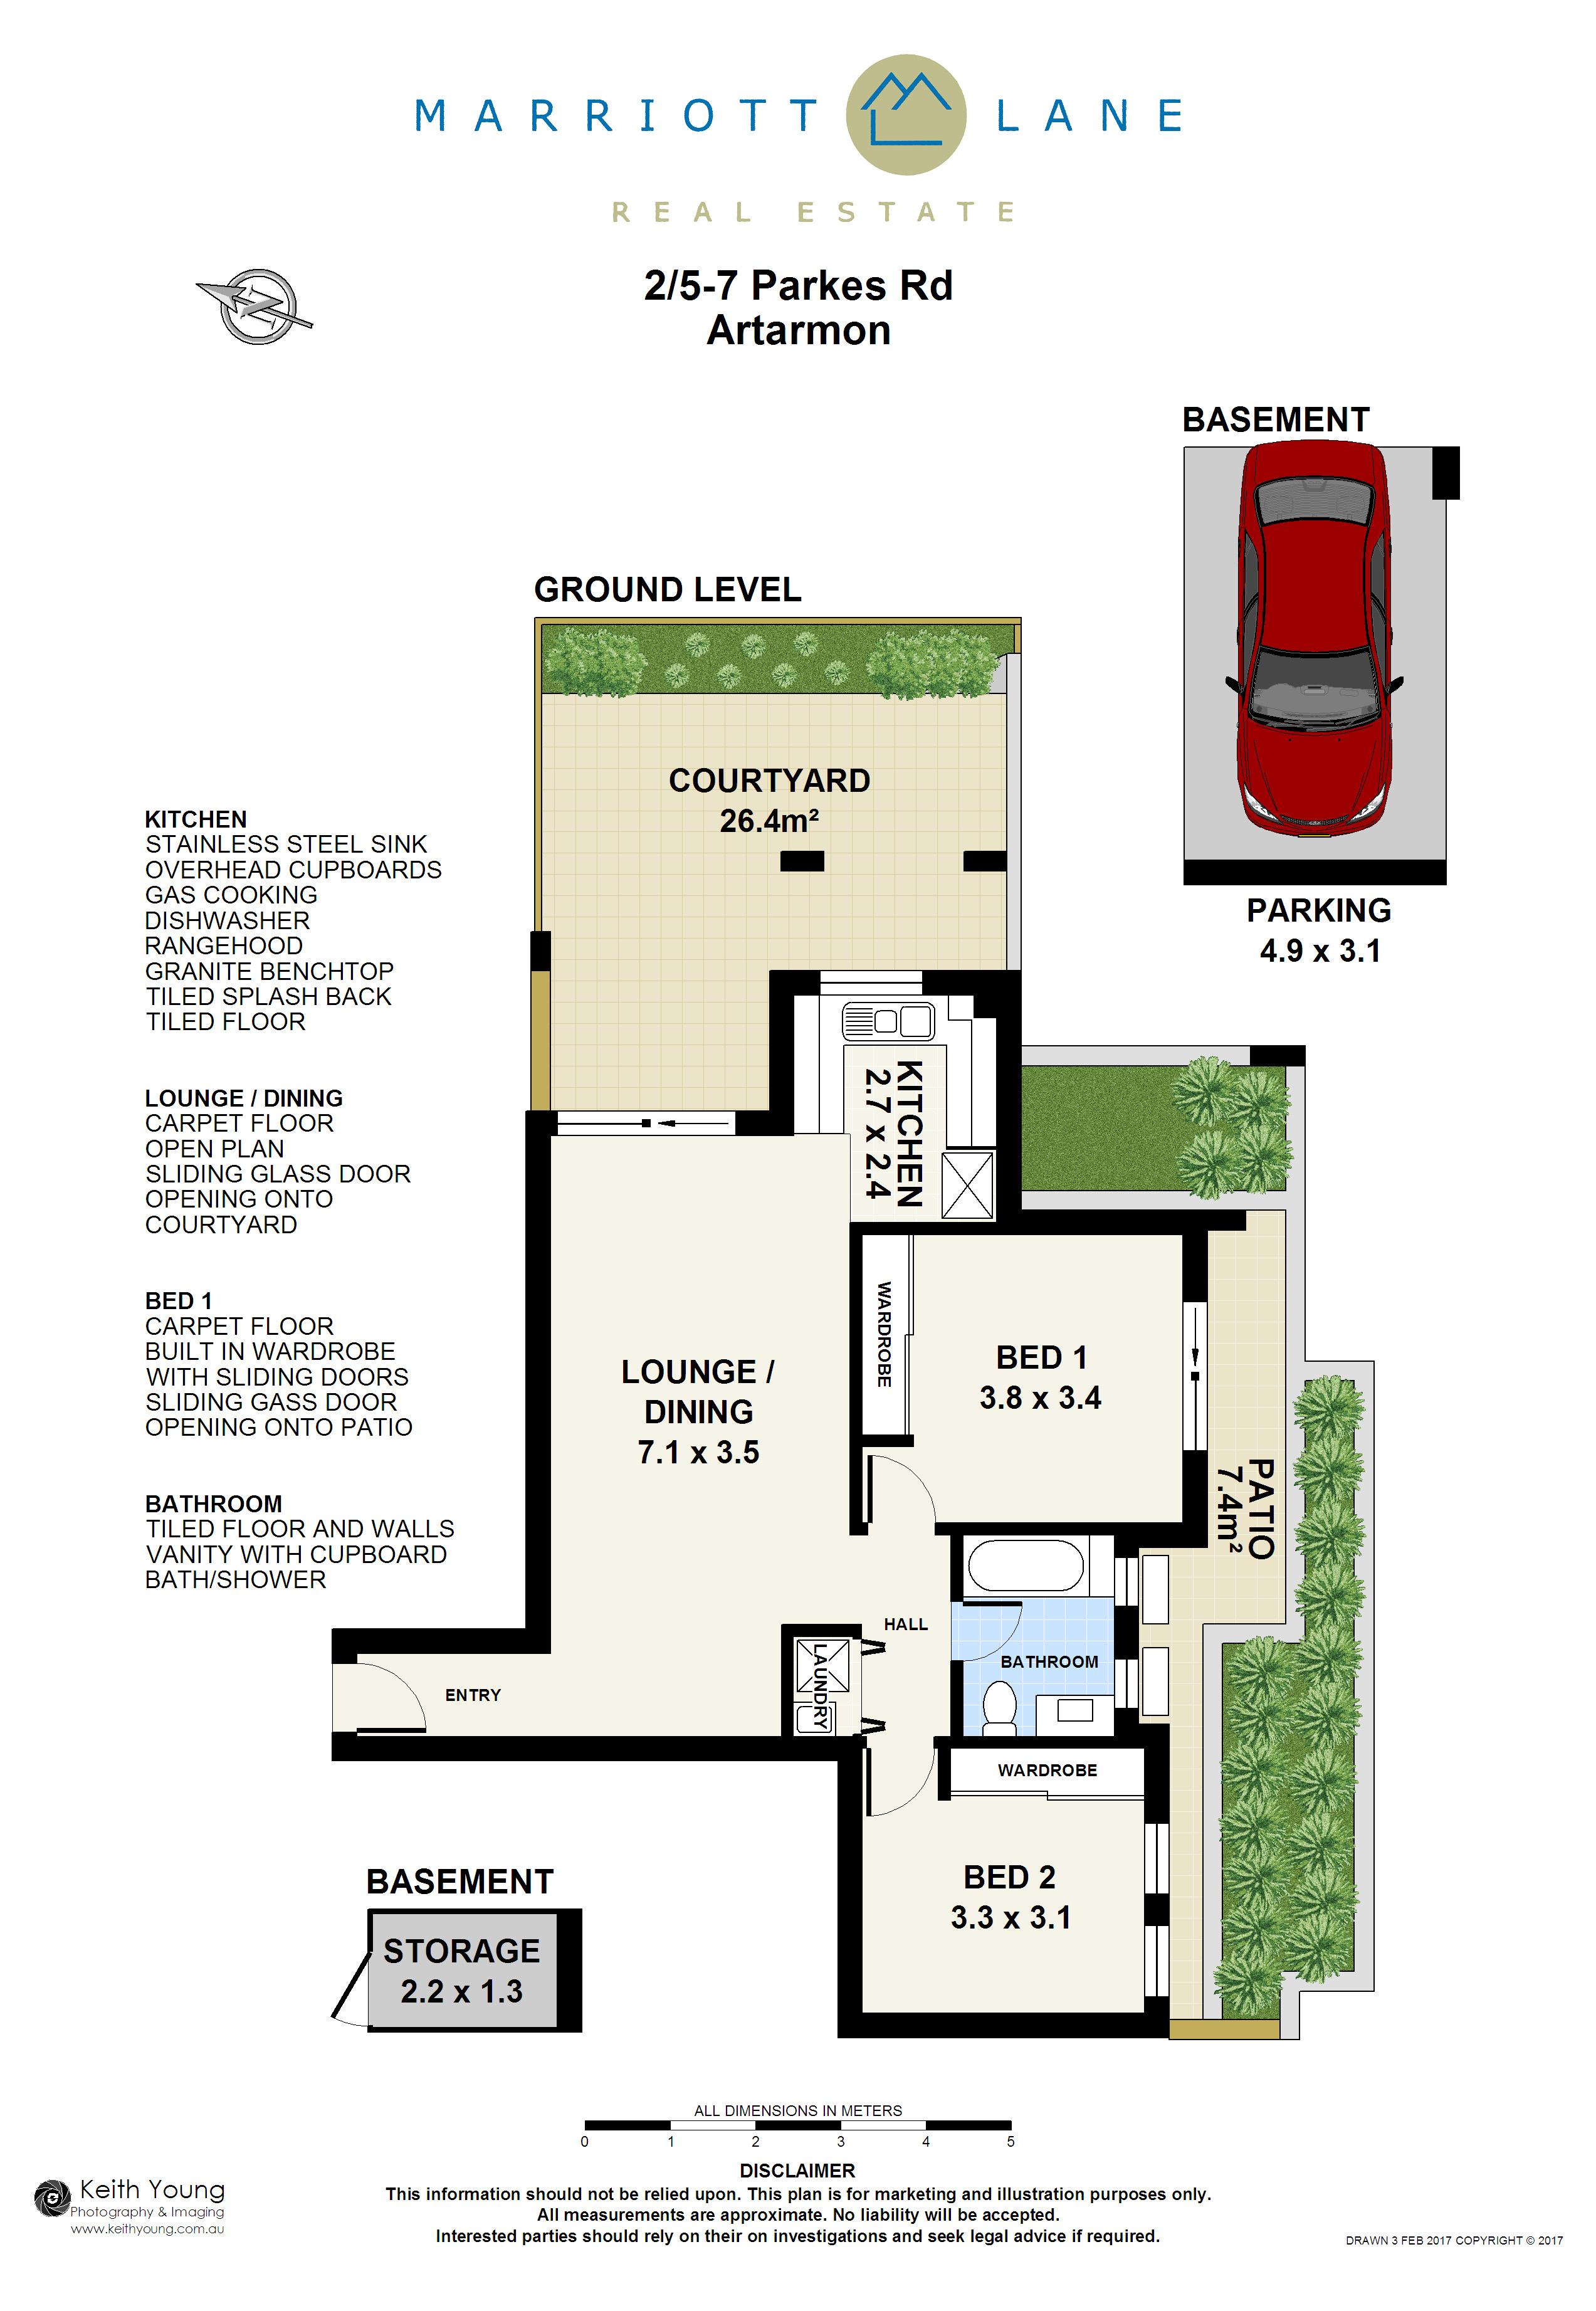 Floorplan  sc 1 st  Marriott Lane Real Estate & 2/5-7 Parkes Road Artarmon NSW 2064 - Unit Sold - marriottlane.com.au